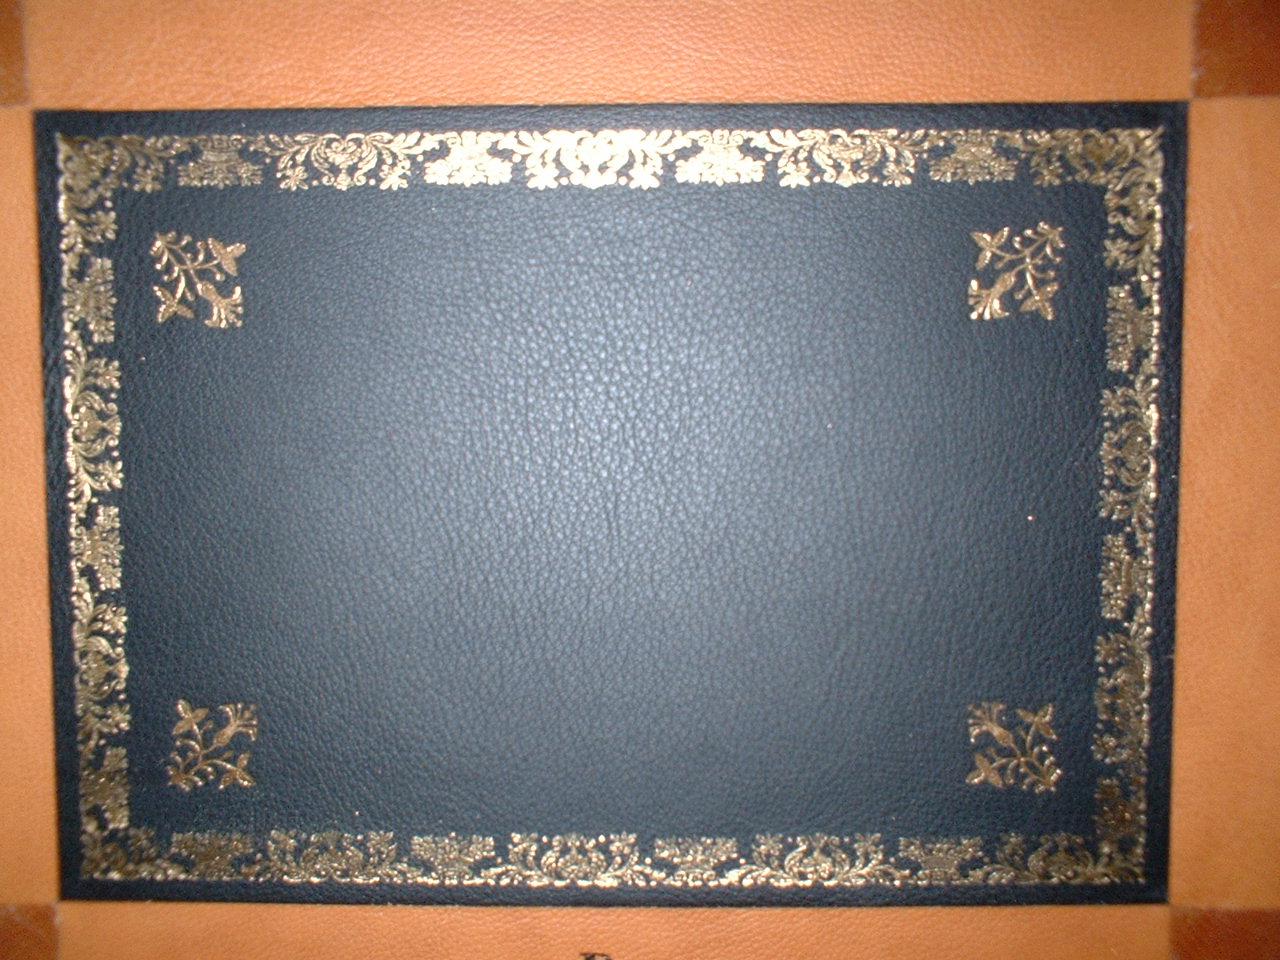 eric machard. Black Bedroom Furniture Sets. Home Design Ideas